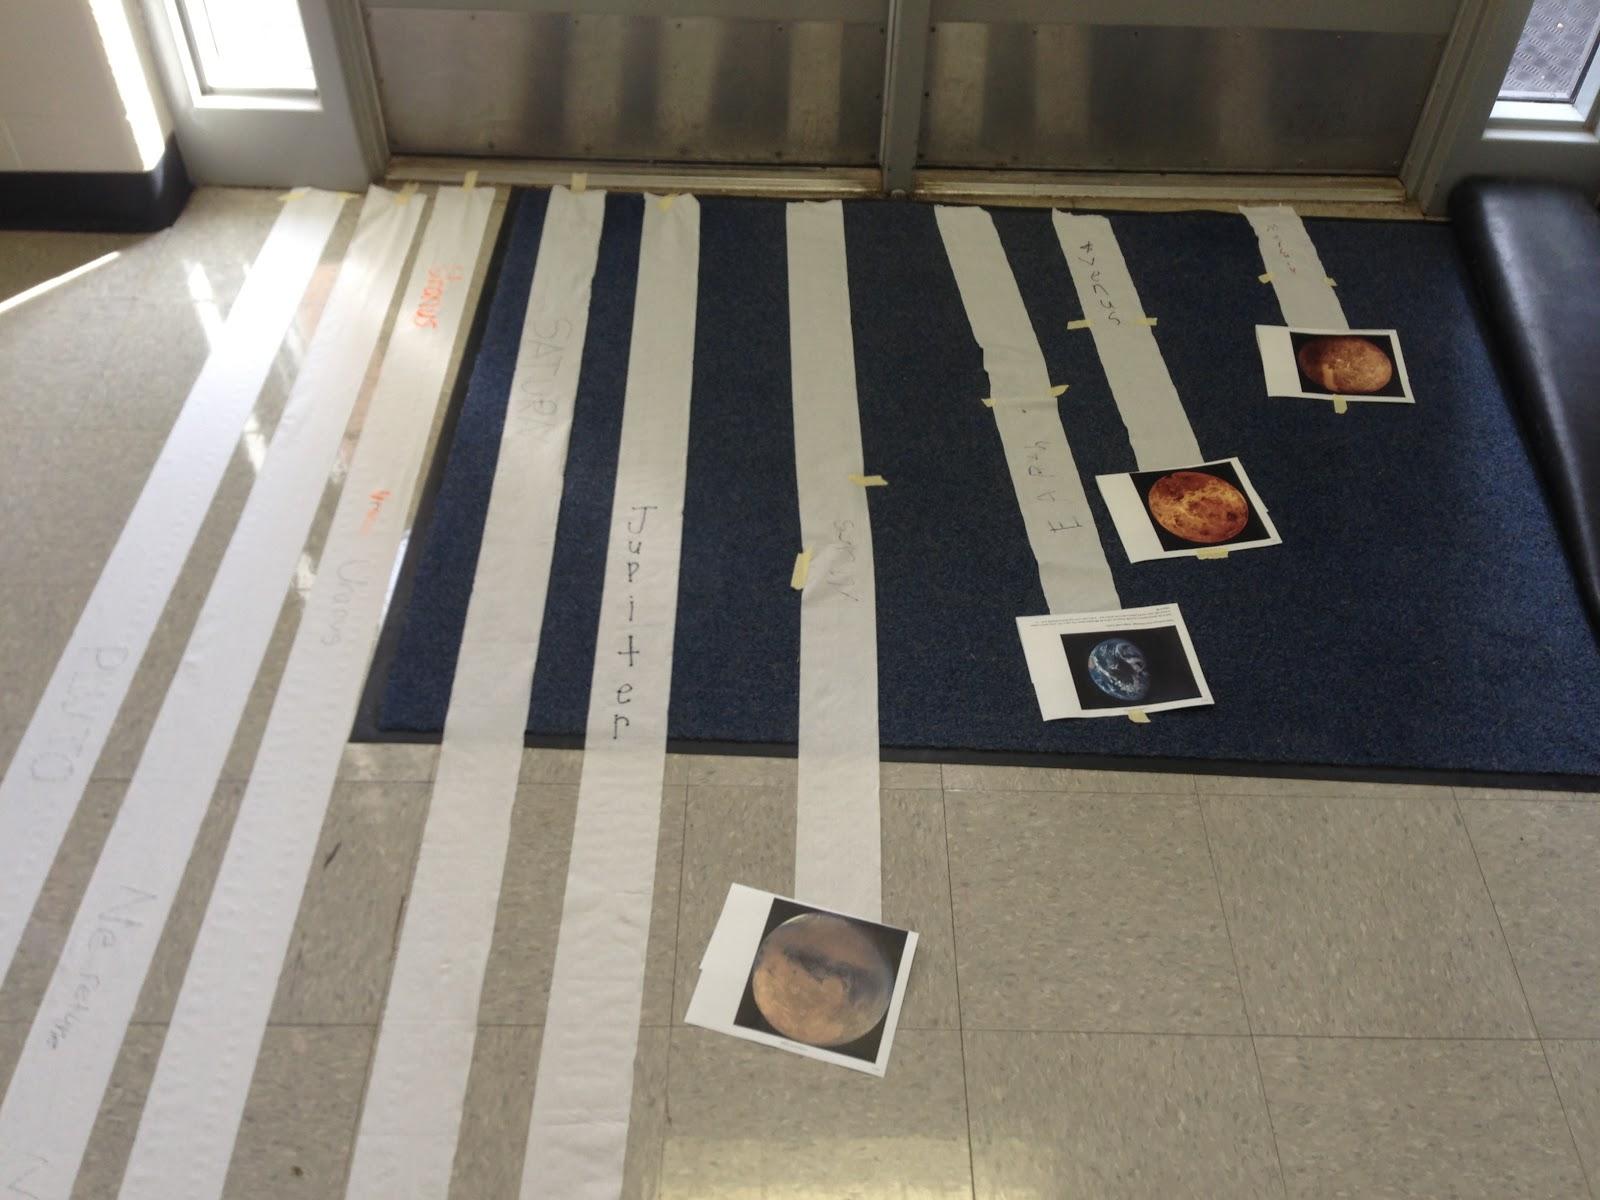 toilet paper solar system activity - photo #14